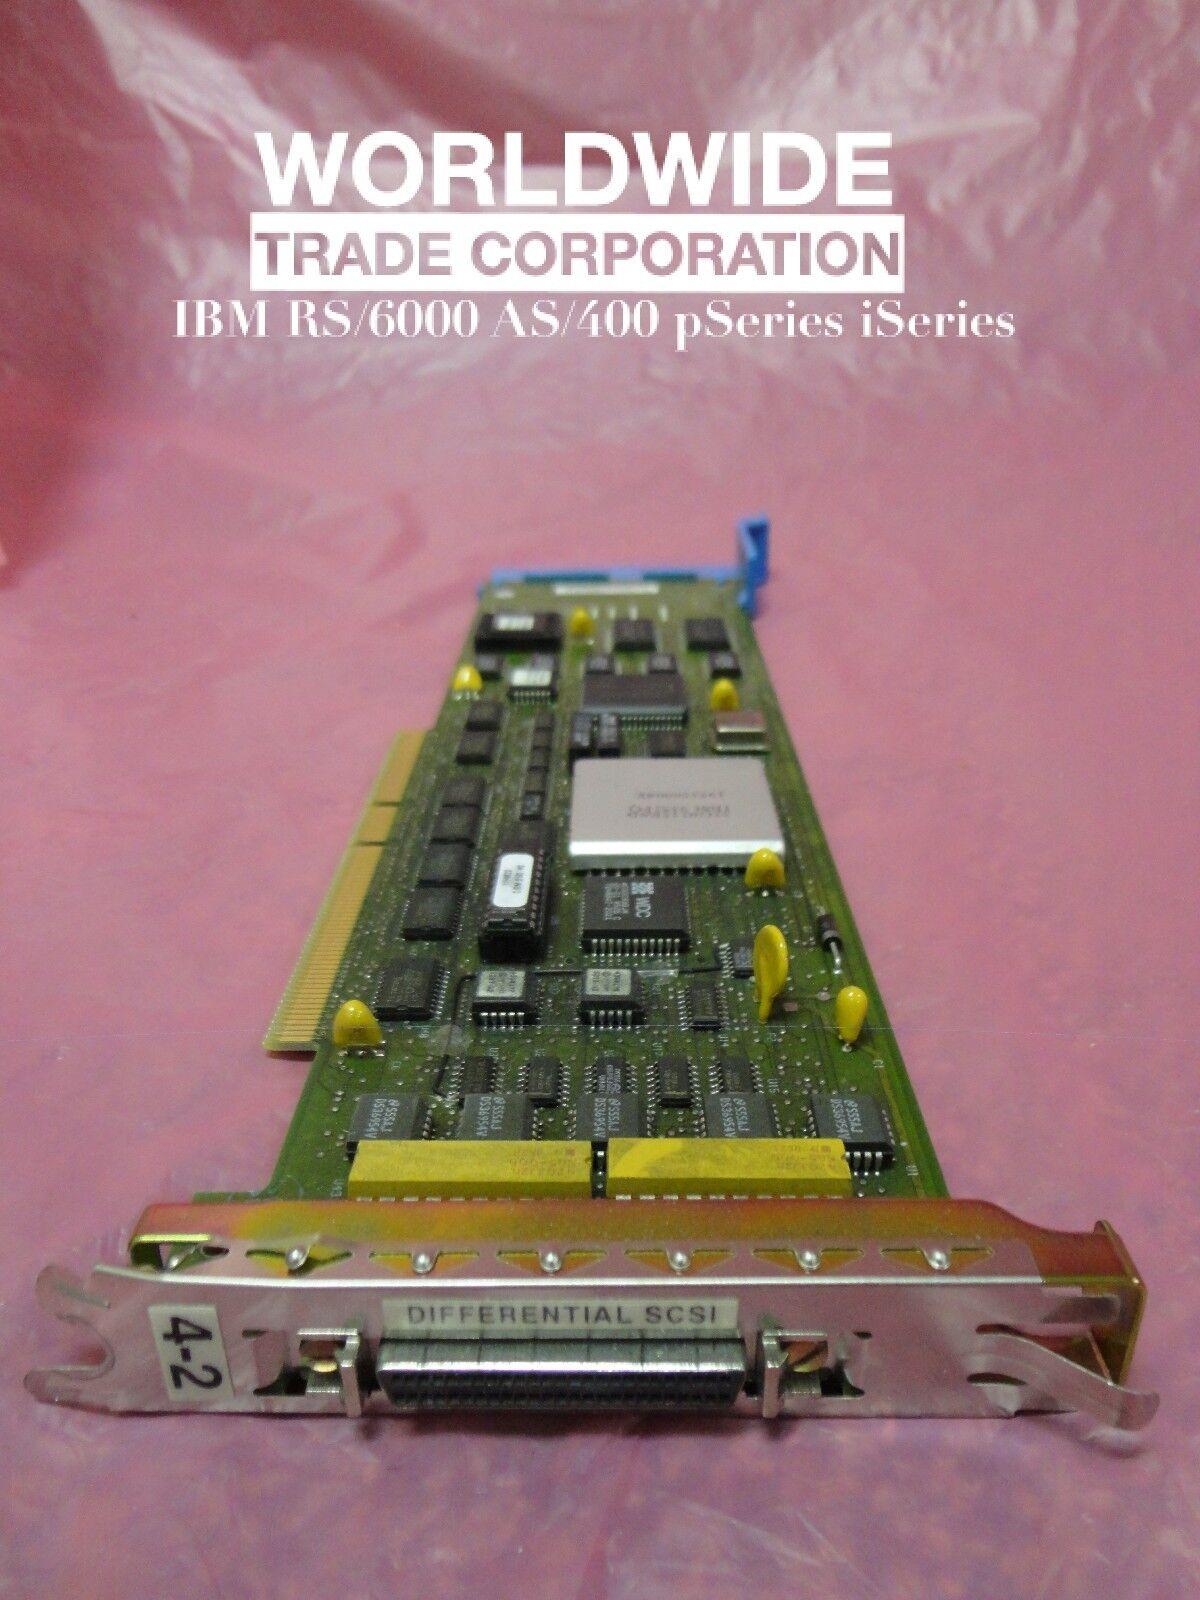 IBM 11H2447 SCSI-2 Differential SCSI Controller FRU 11H2447